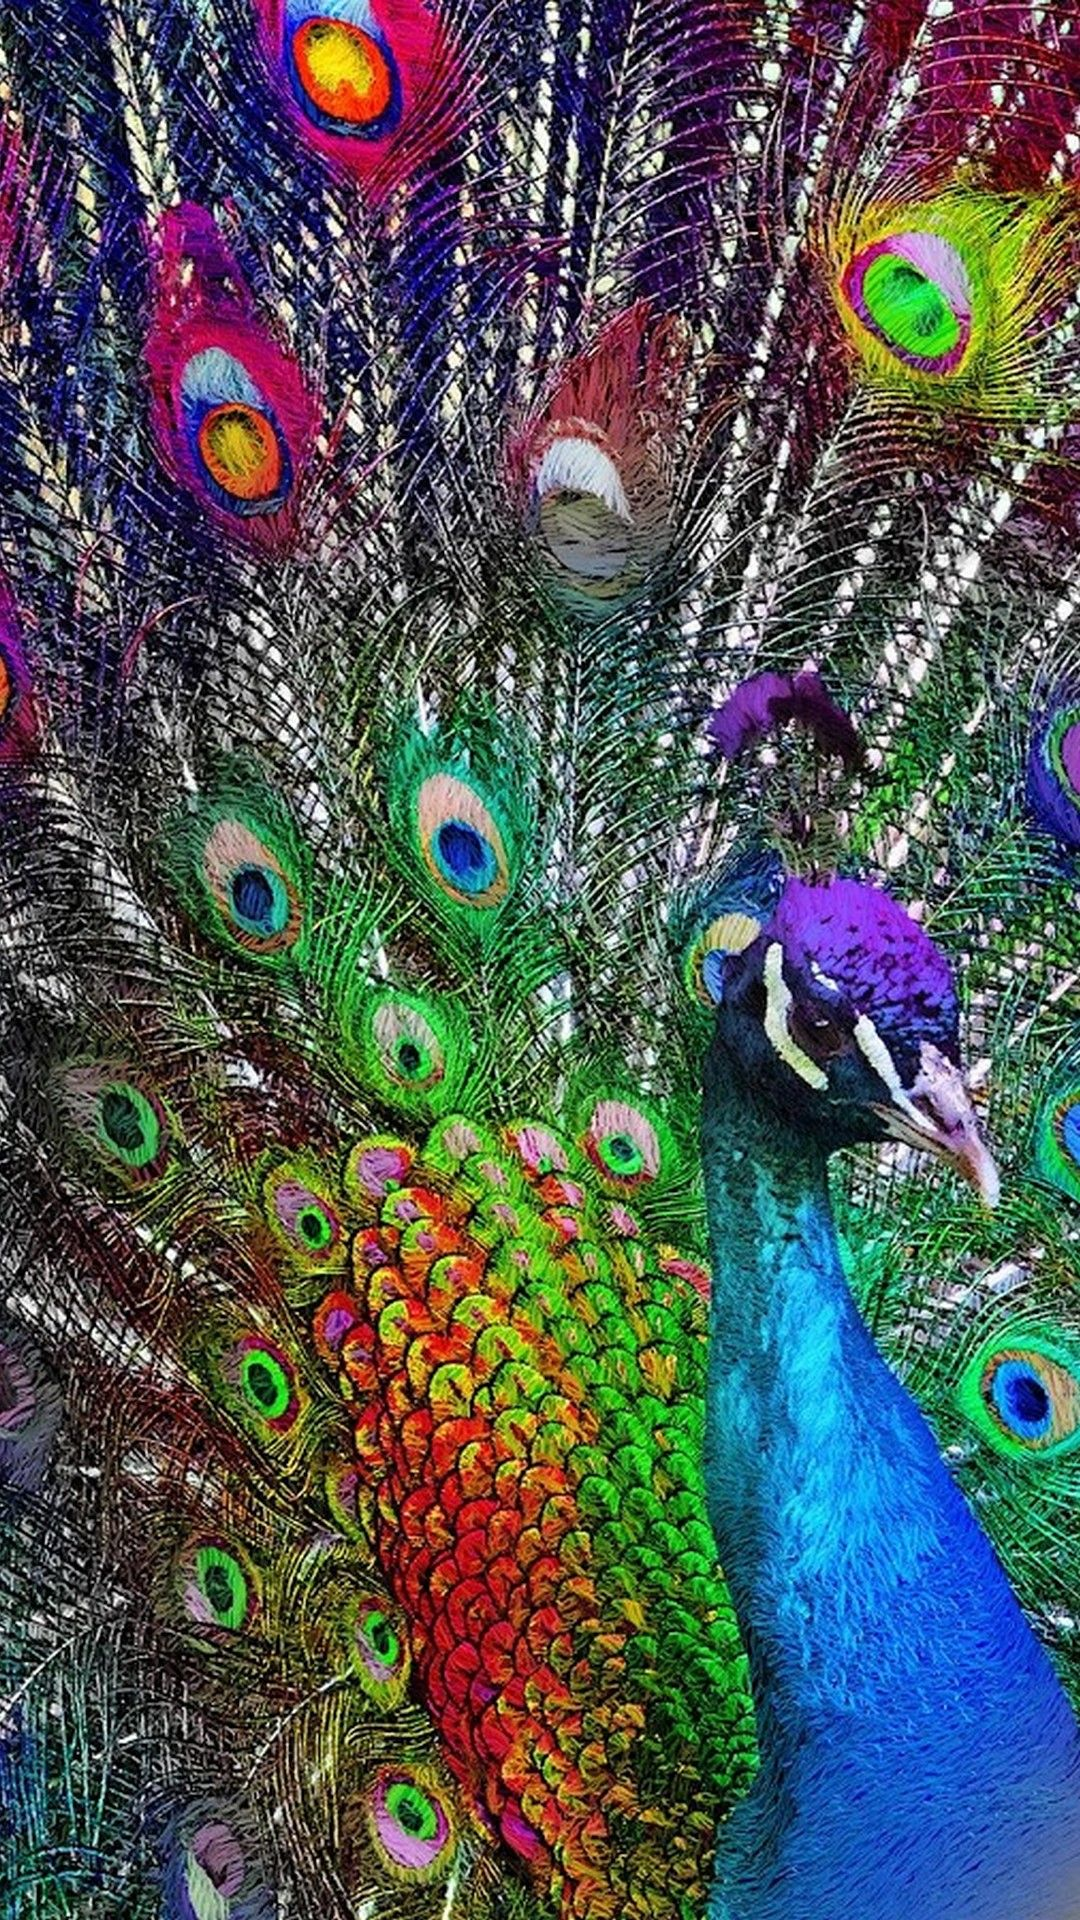 Purple Peacock Wallpaper For Iphone Best Iphone Wallpaper Peacock Wallpaper Pink Wallpaper Iphone Purple Wallpaper Iphone